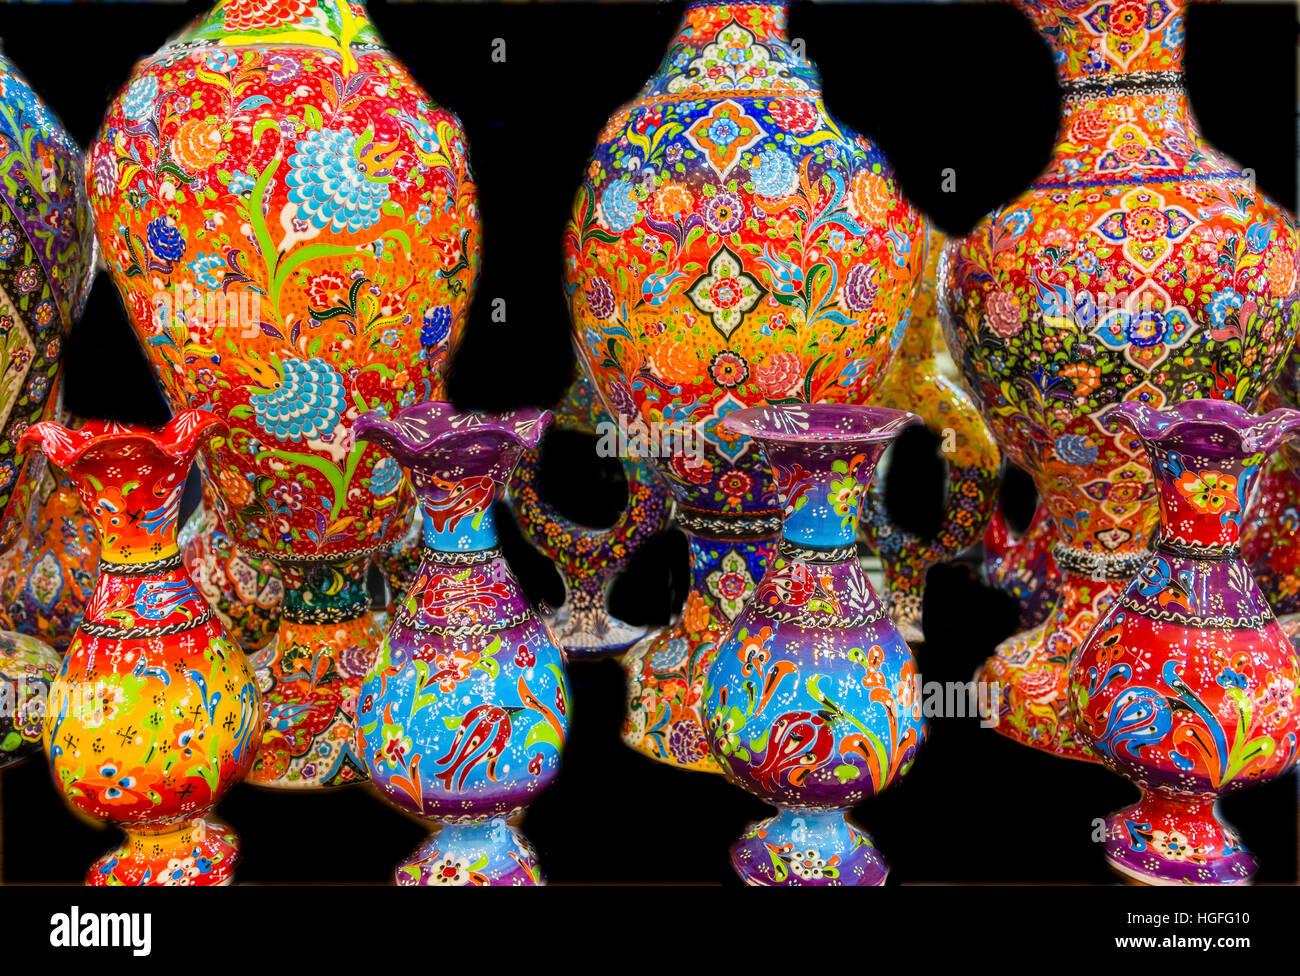 Ancient Arab Islamic Designs Pottery Vases Madaba Jordan - Stock Image